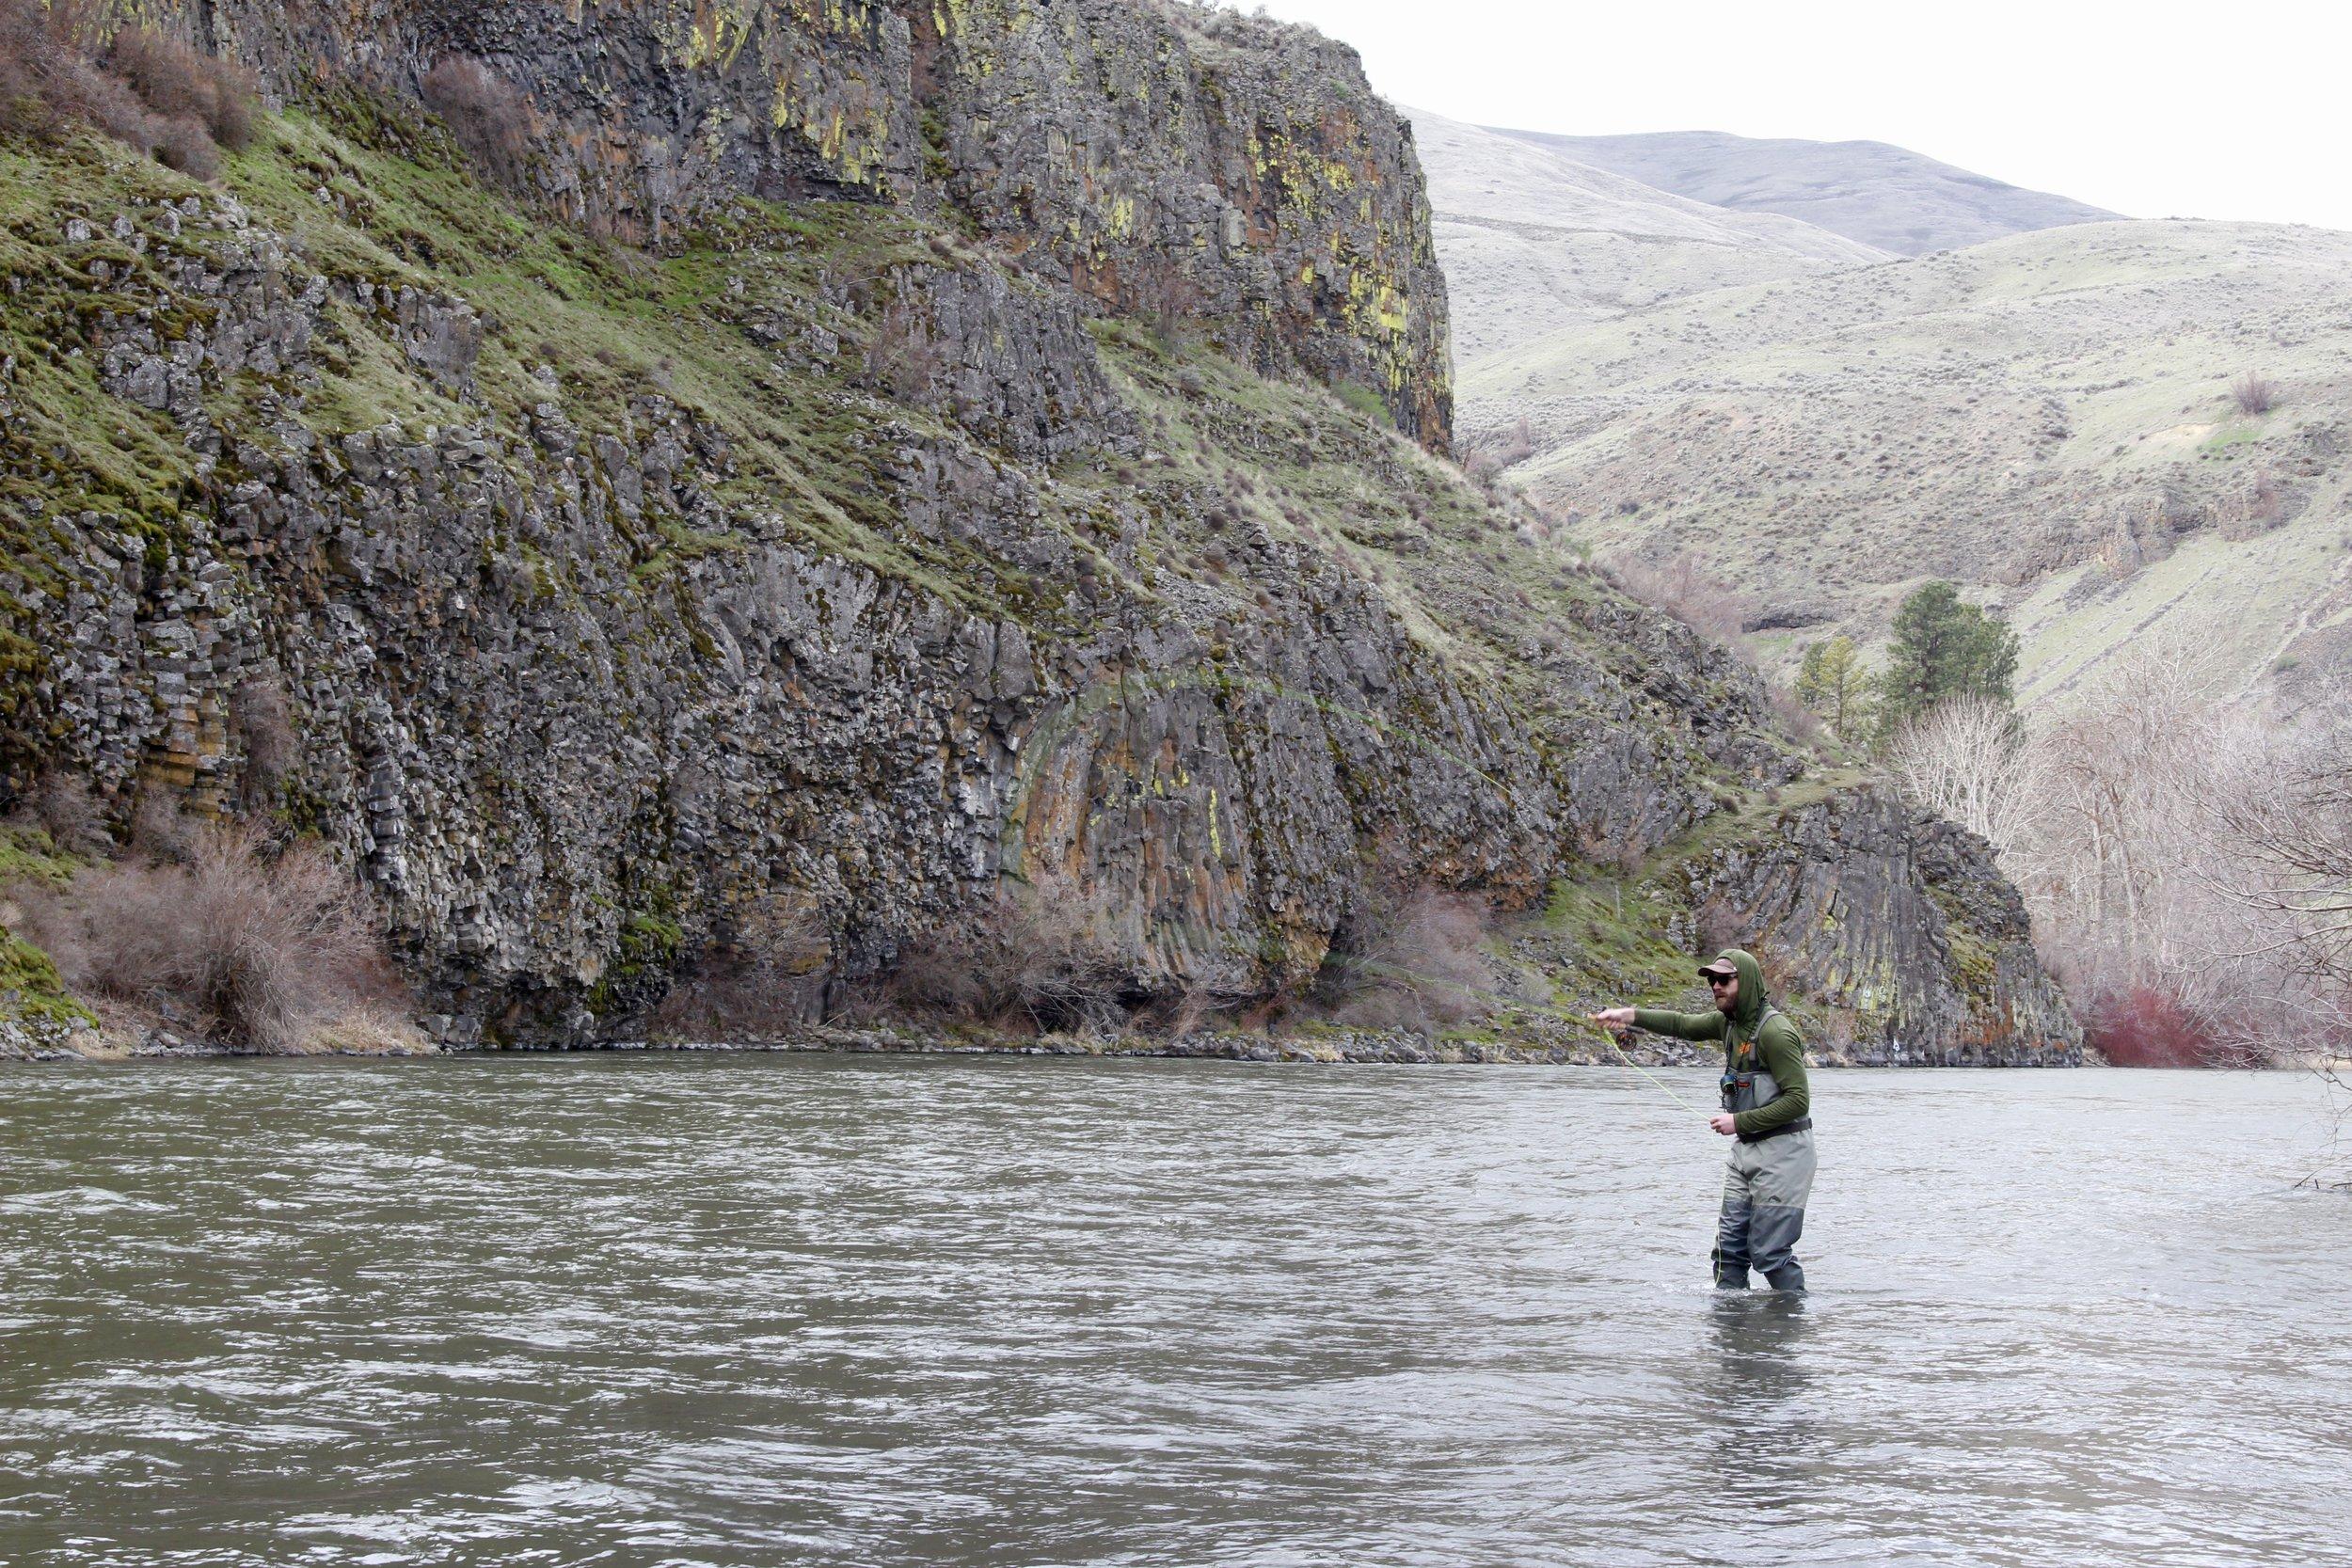 Yakima River Canyon Fly Fishing